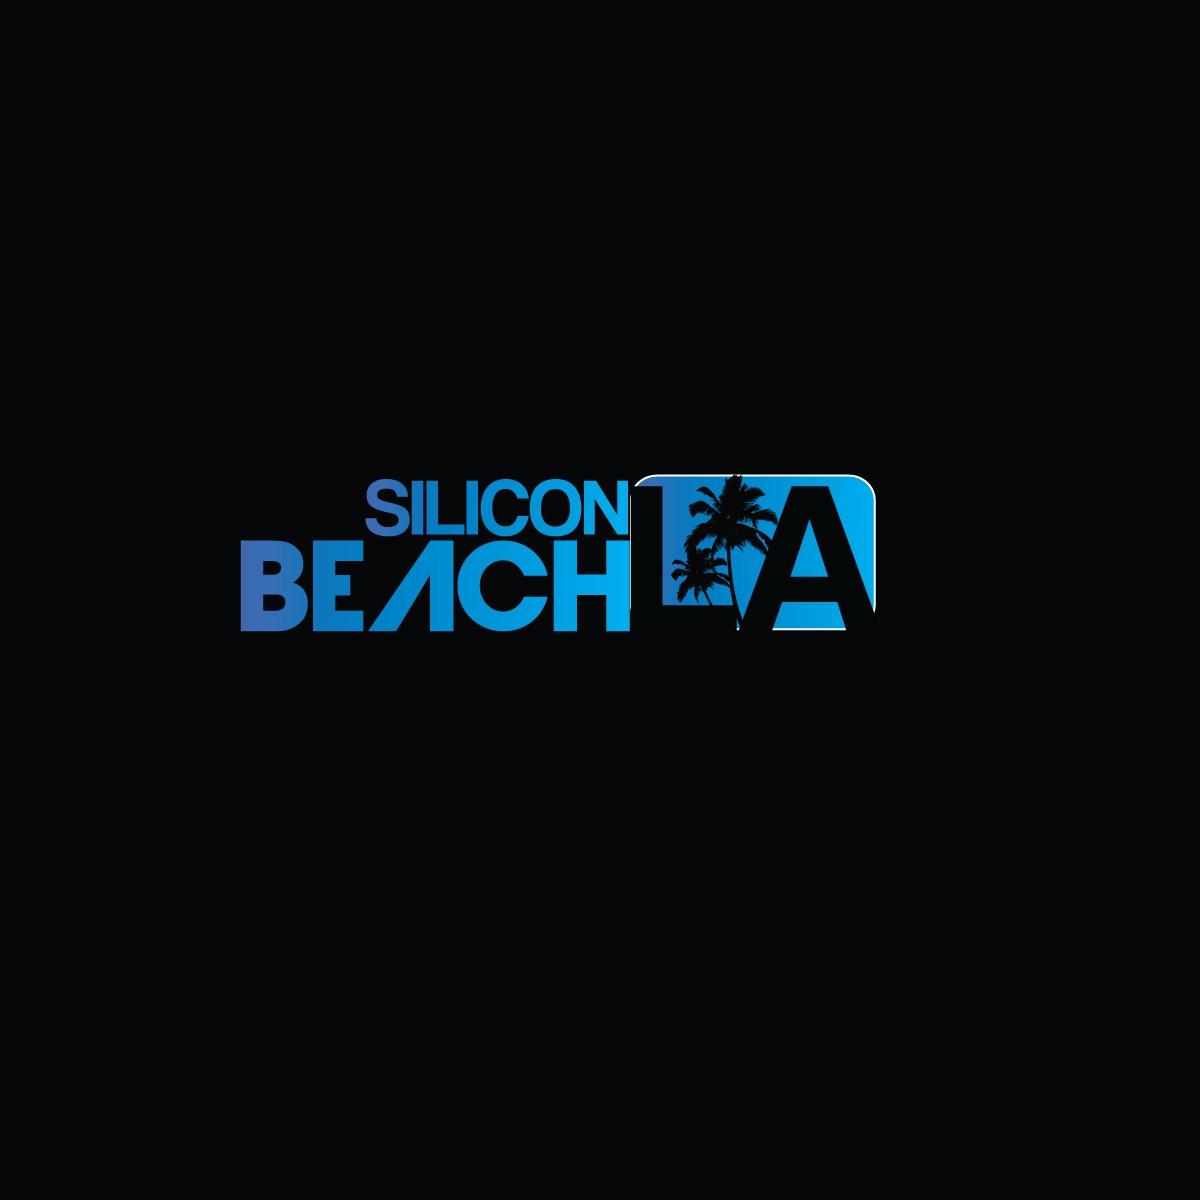 Silicon Beach LA needs a new logo